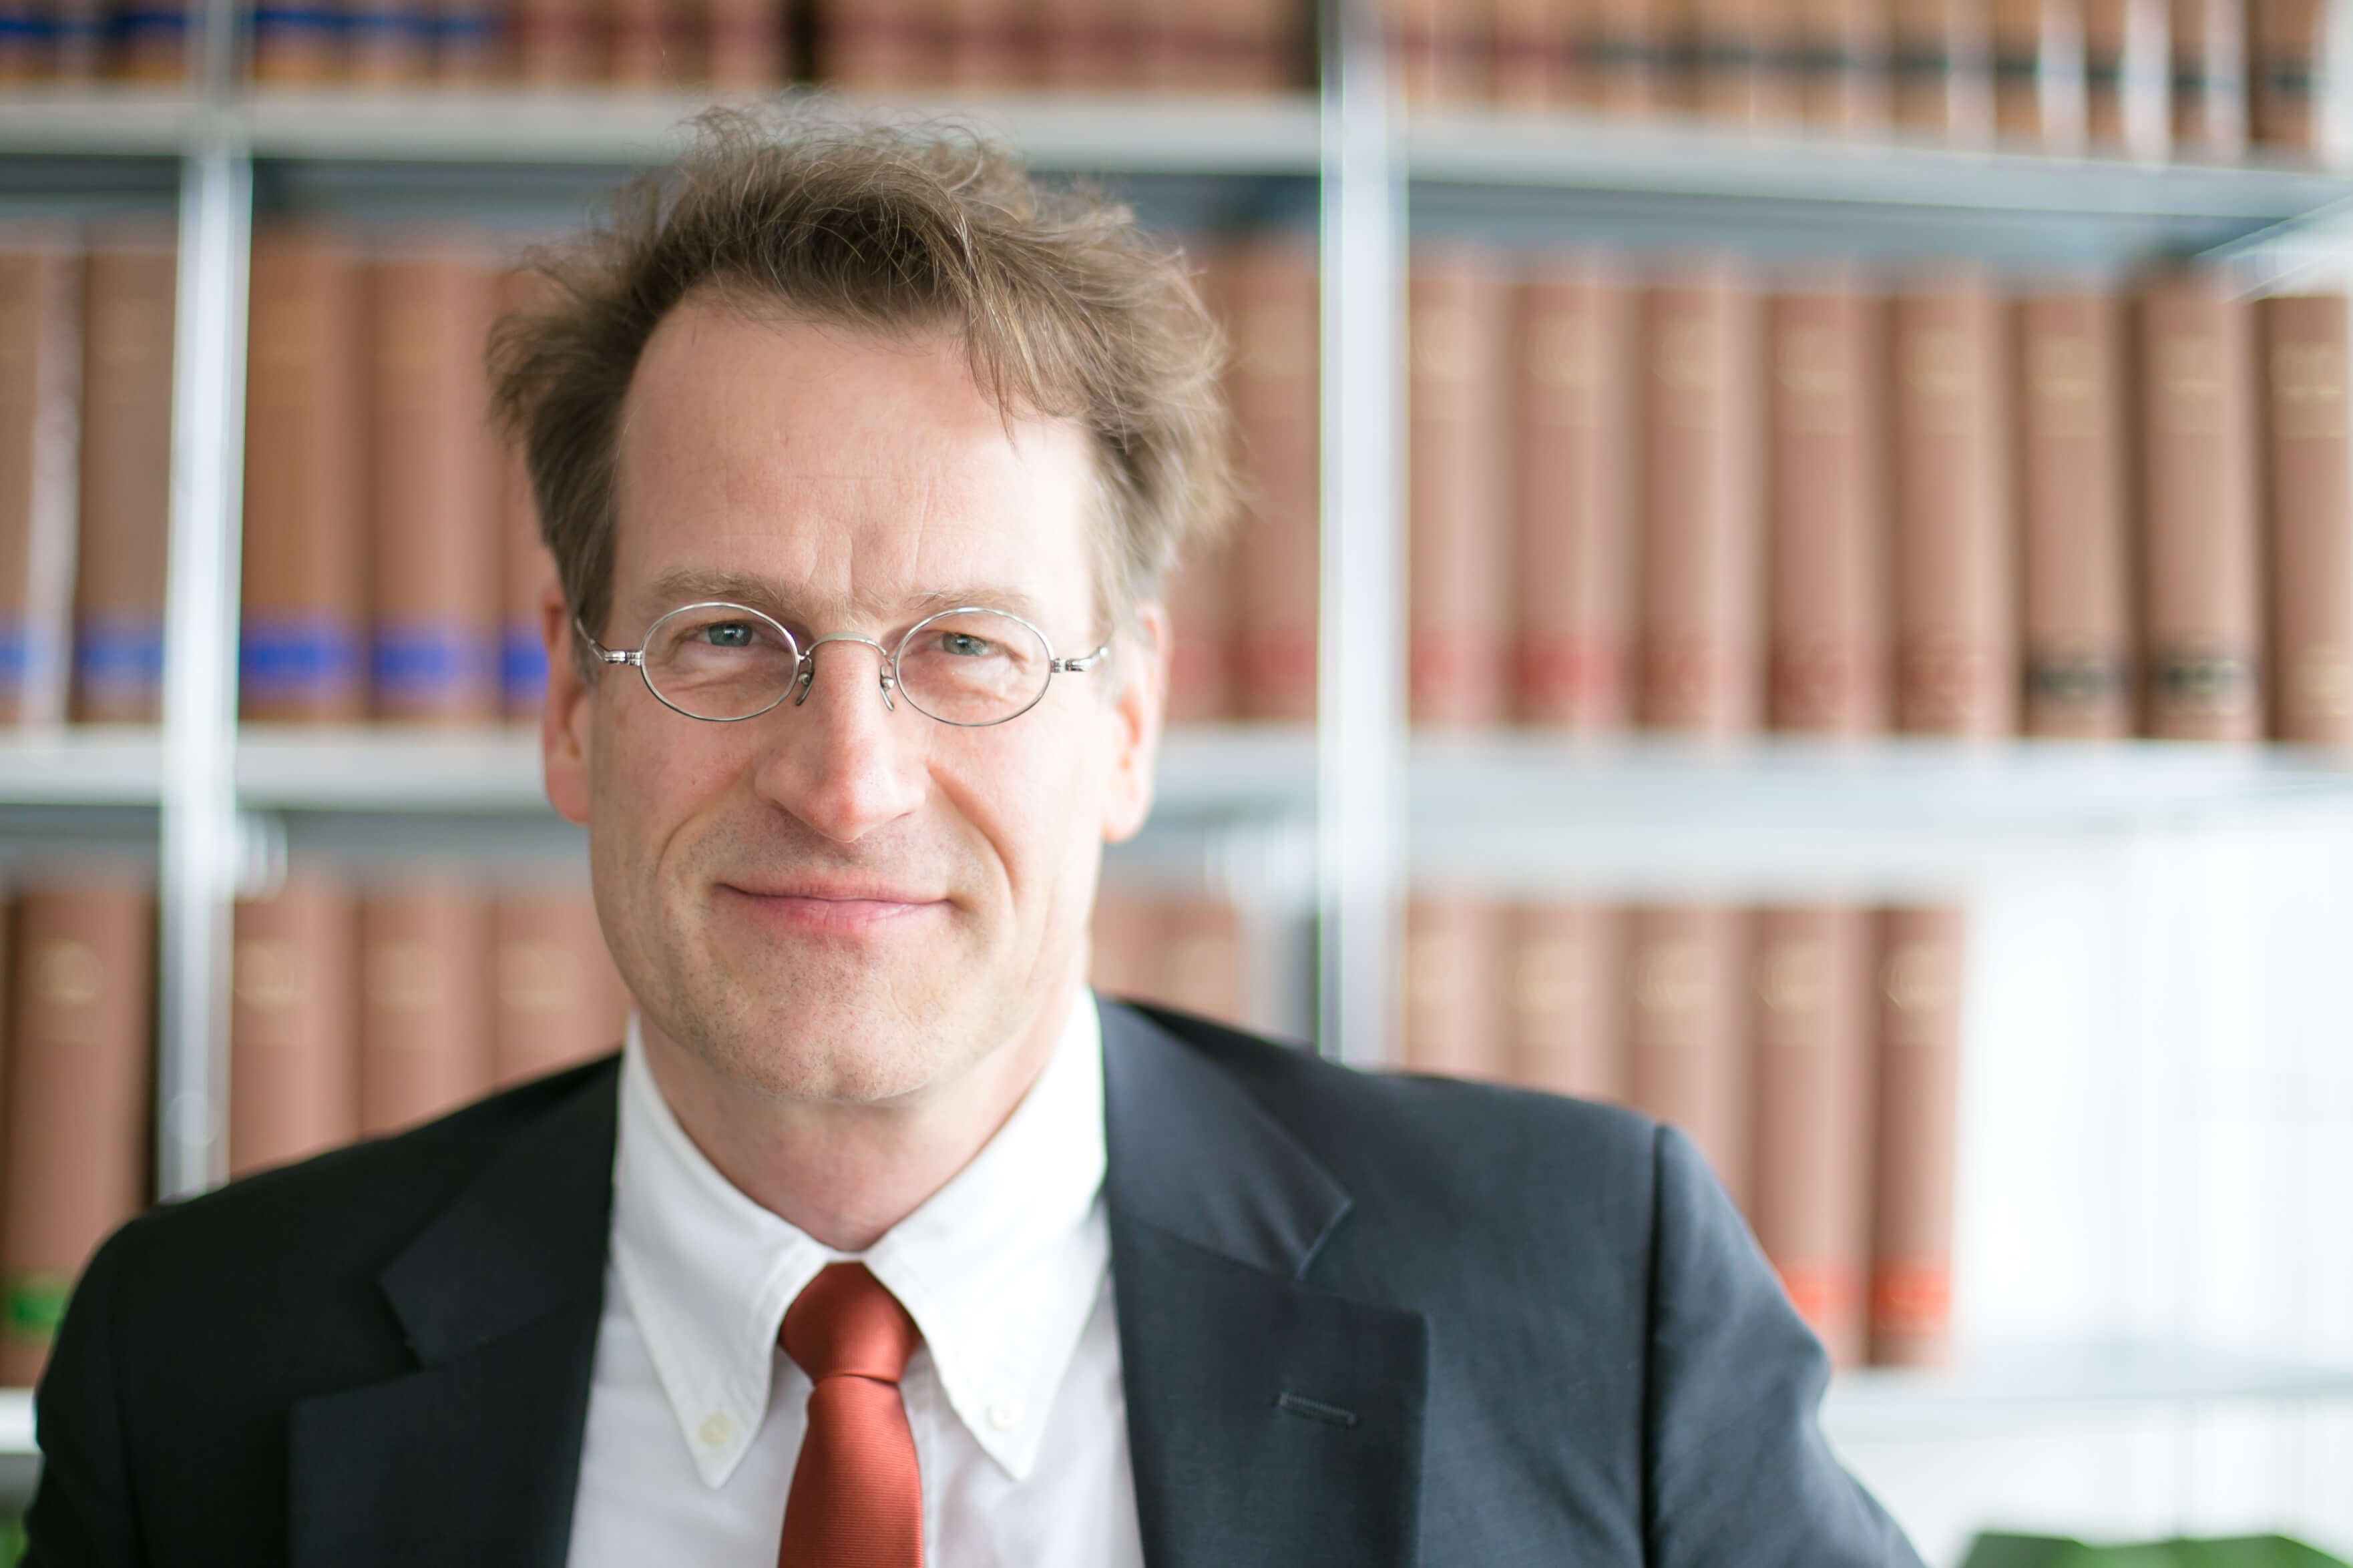 Dr. Roland Wiester